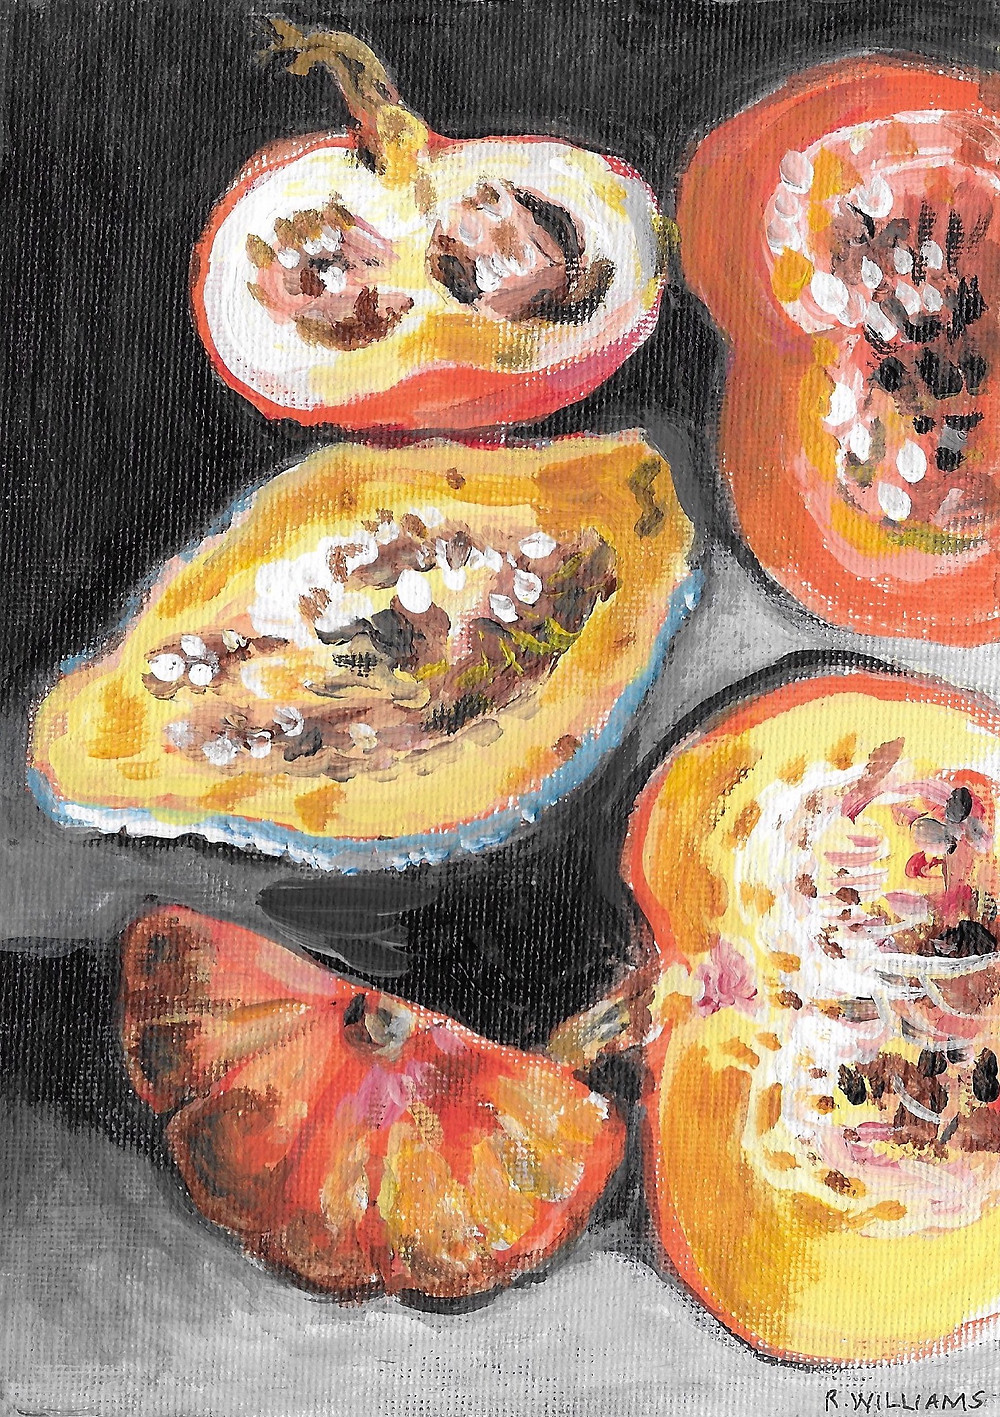 Squash, Pumpkins and Seeds Drawing